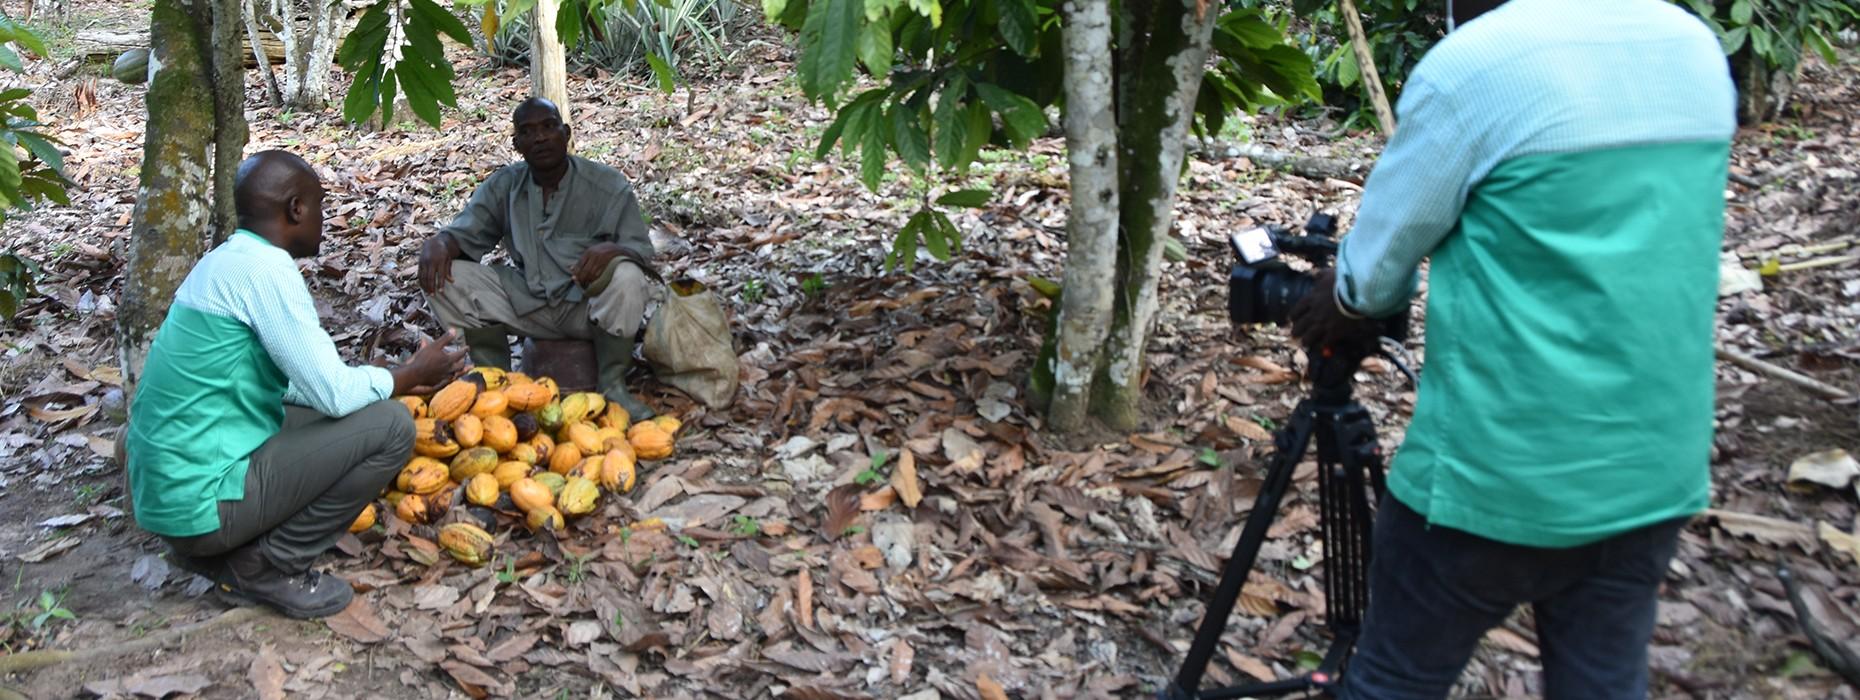 Film Environnemental_Afrique Green Side